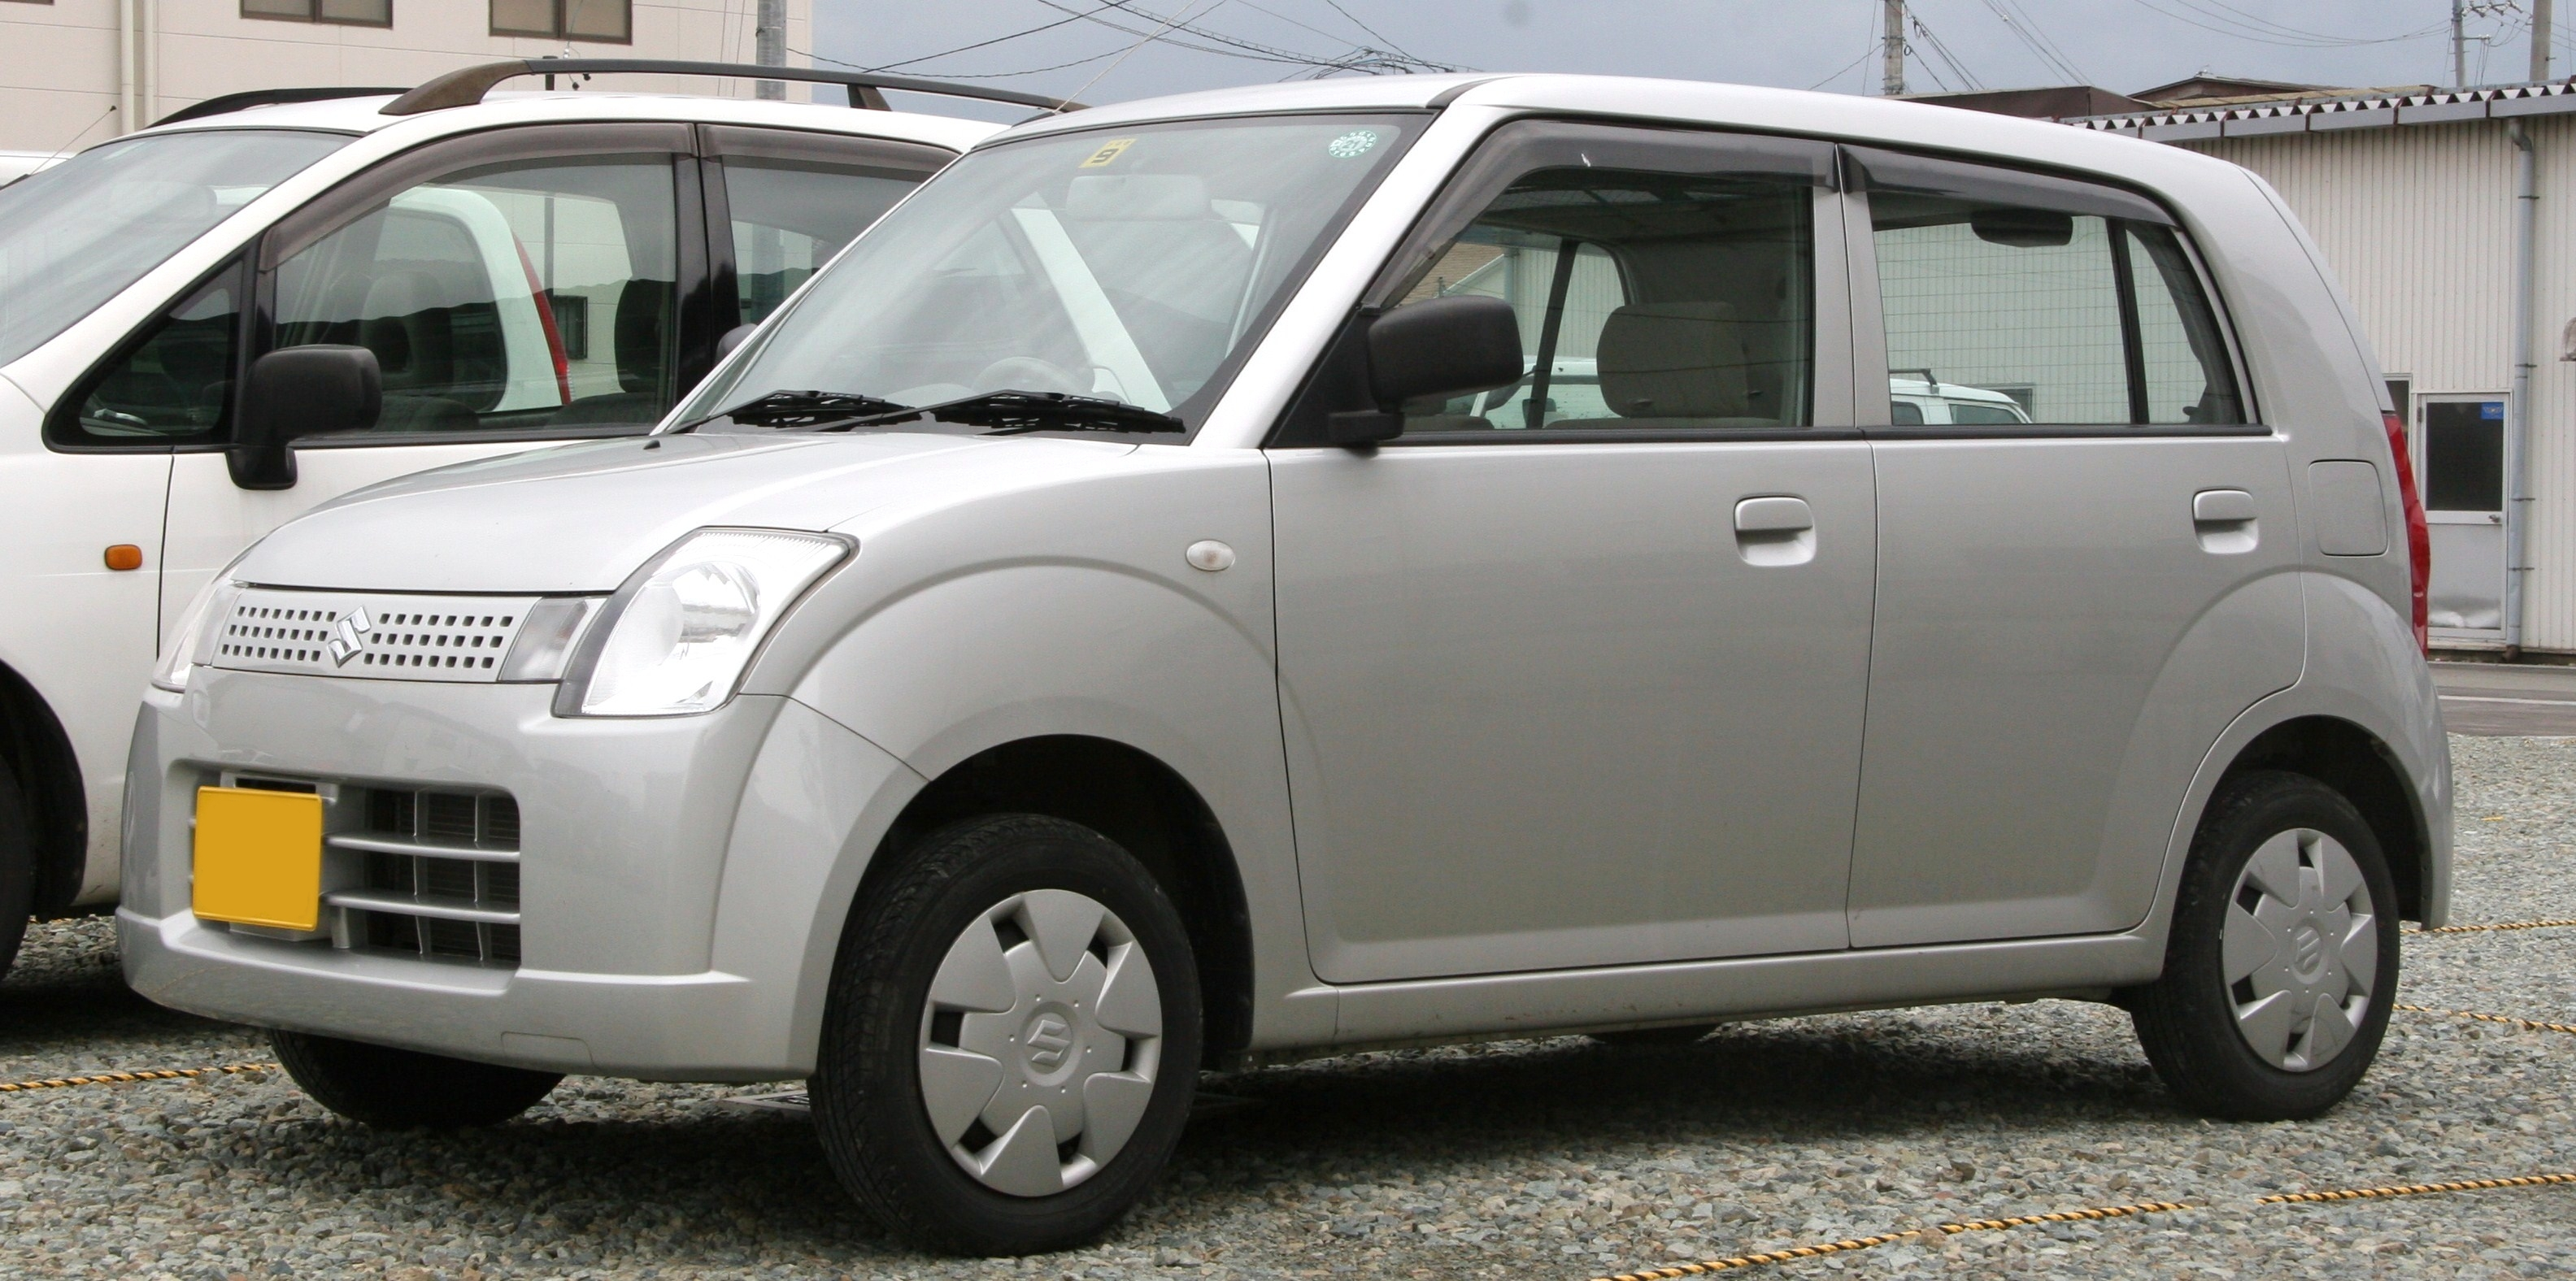 Suzuki Alto 2009 Exterior Side View